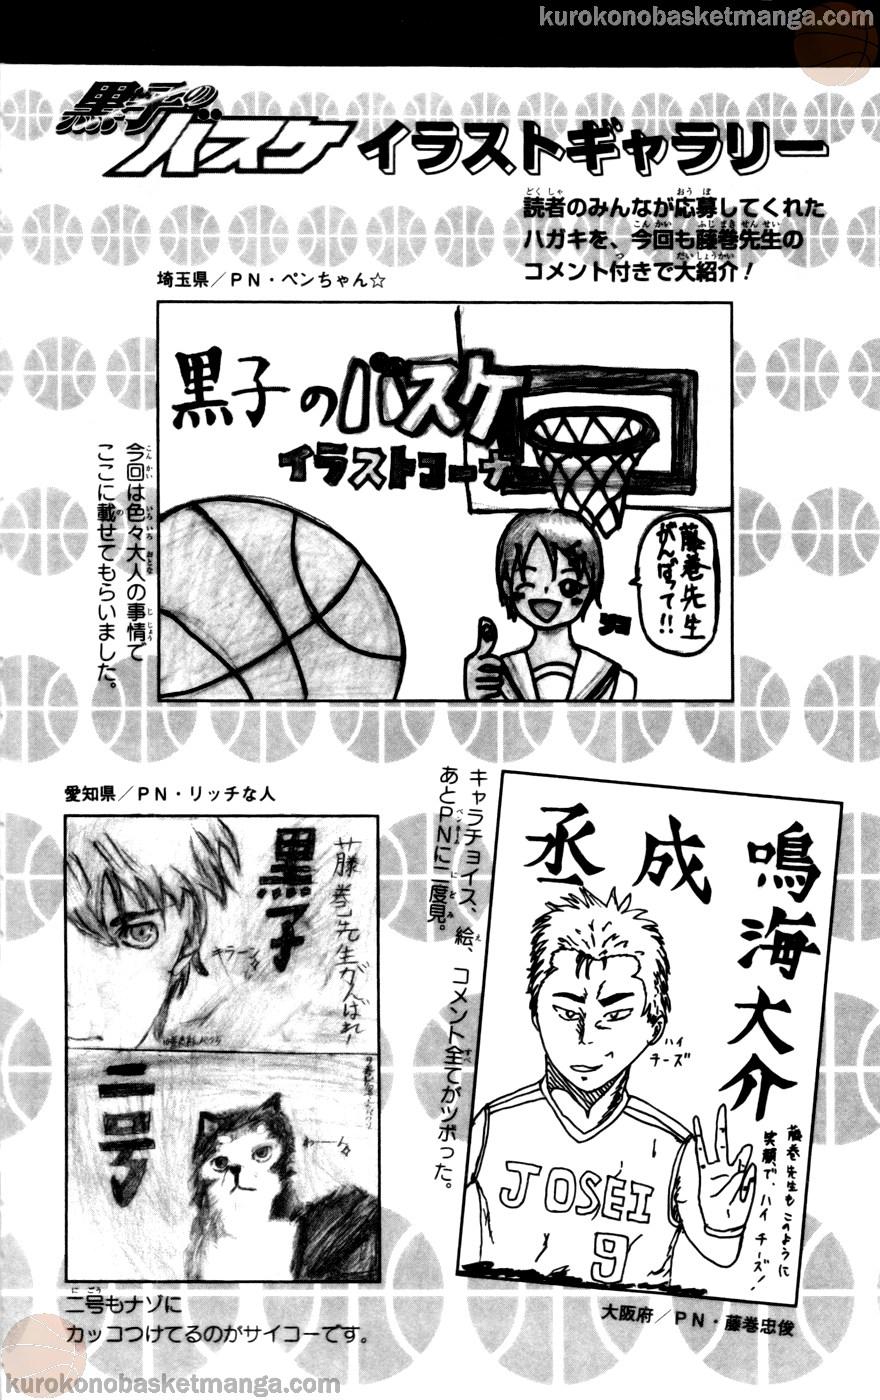 Kuroko no Basket Manga Chapter 95 - Image 22